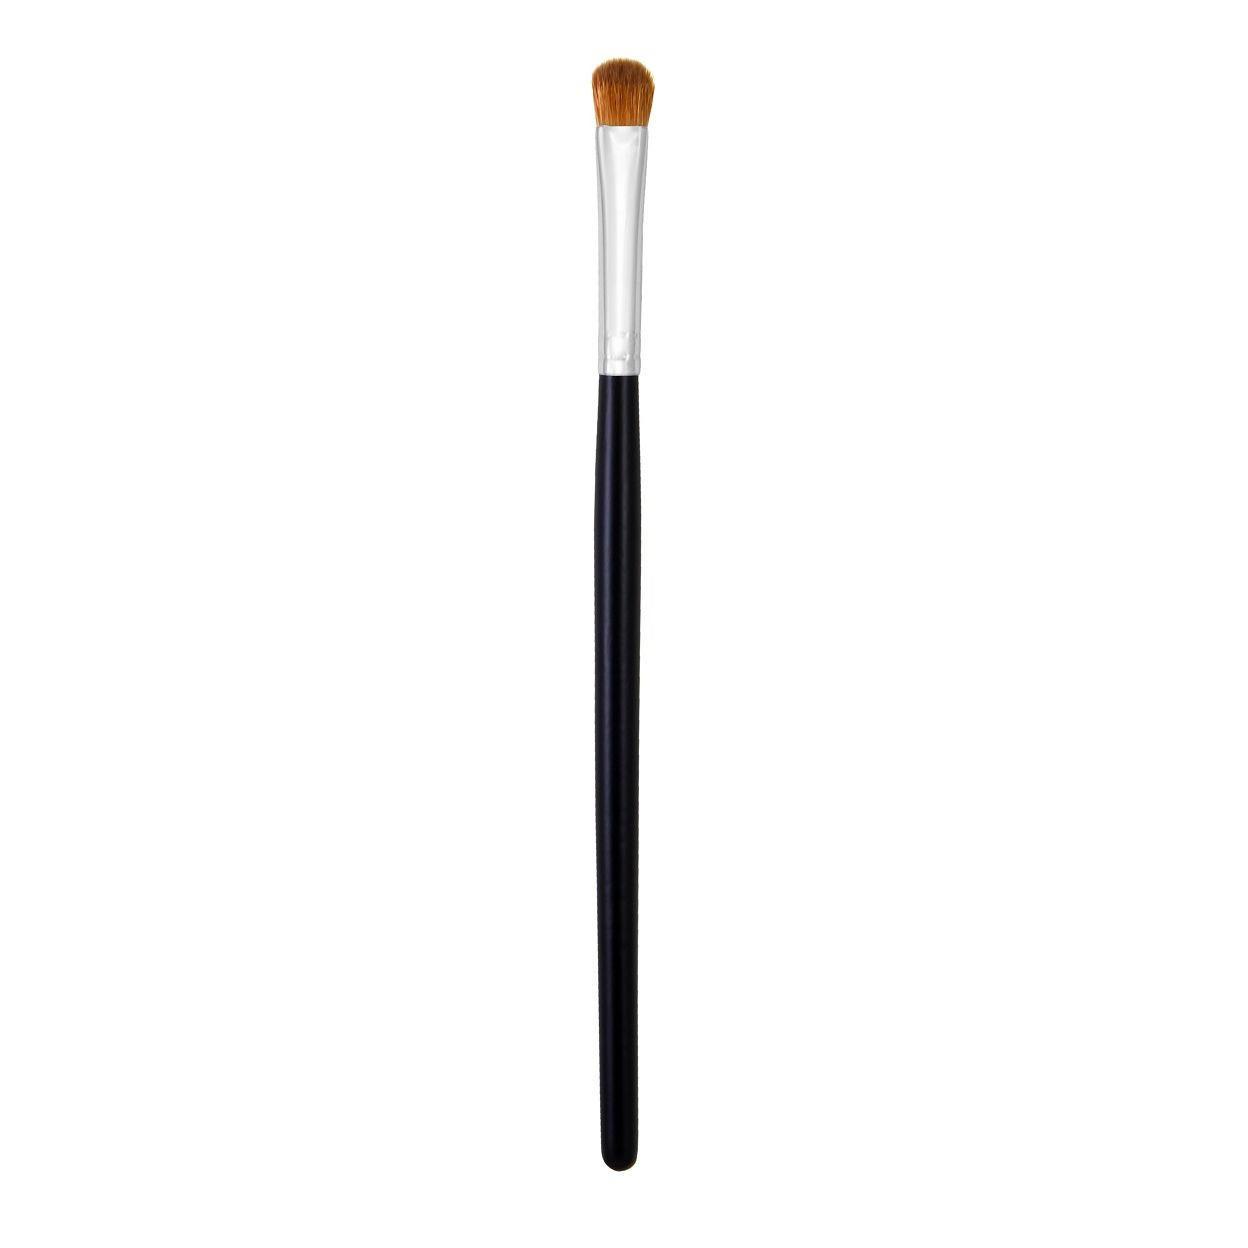 Morphe Firm Shadow Brush M124